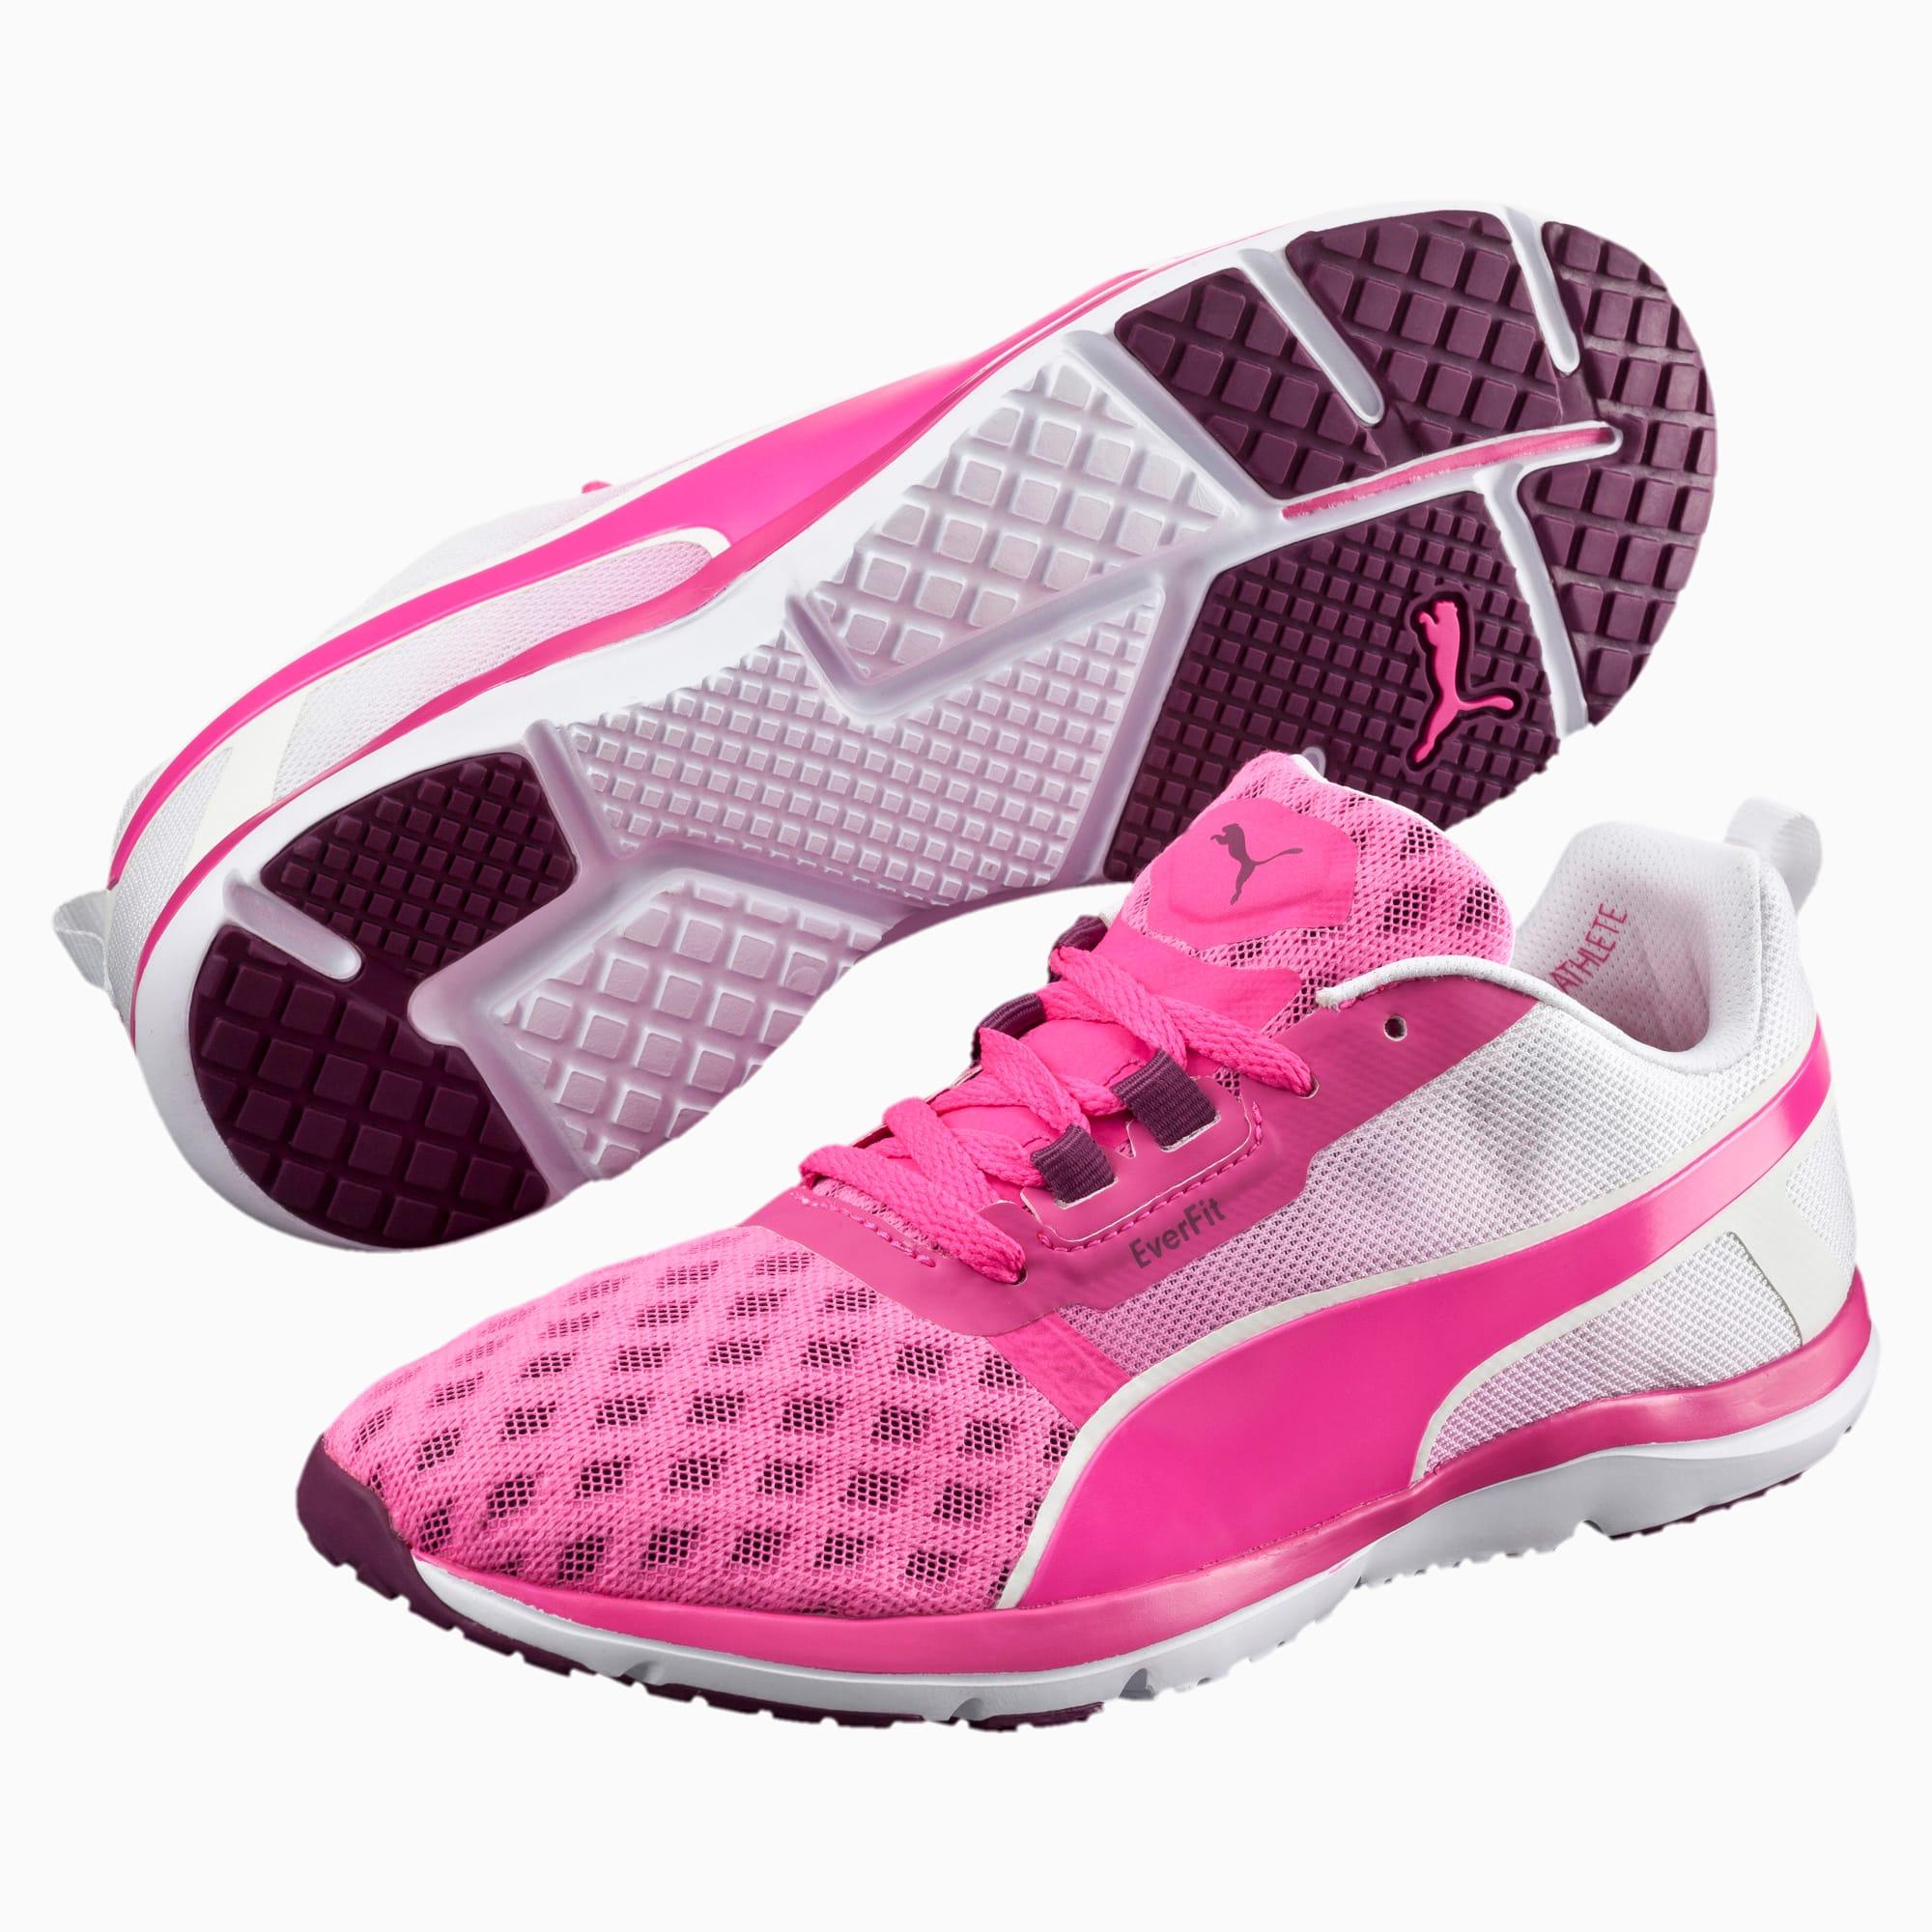 chaussure fitness femme puma